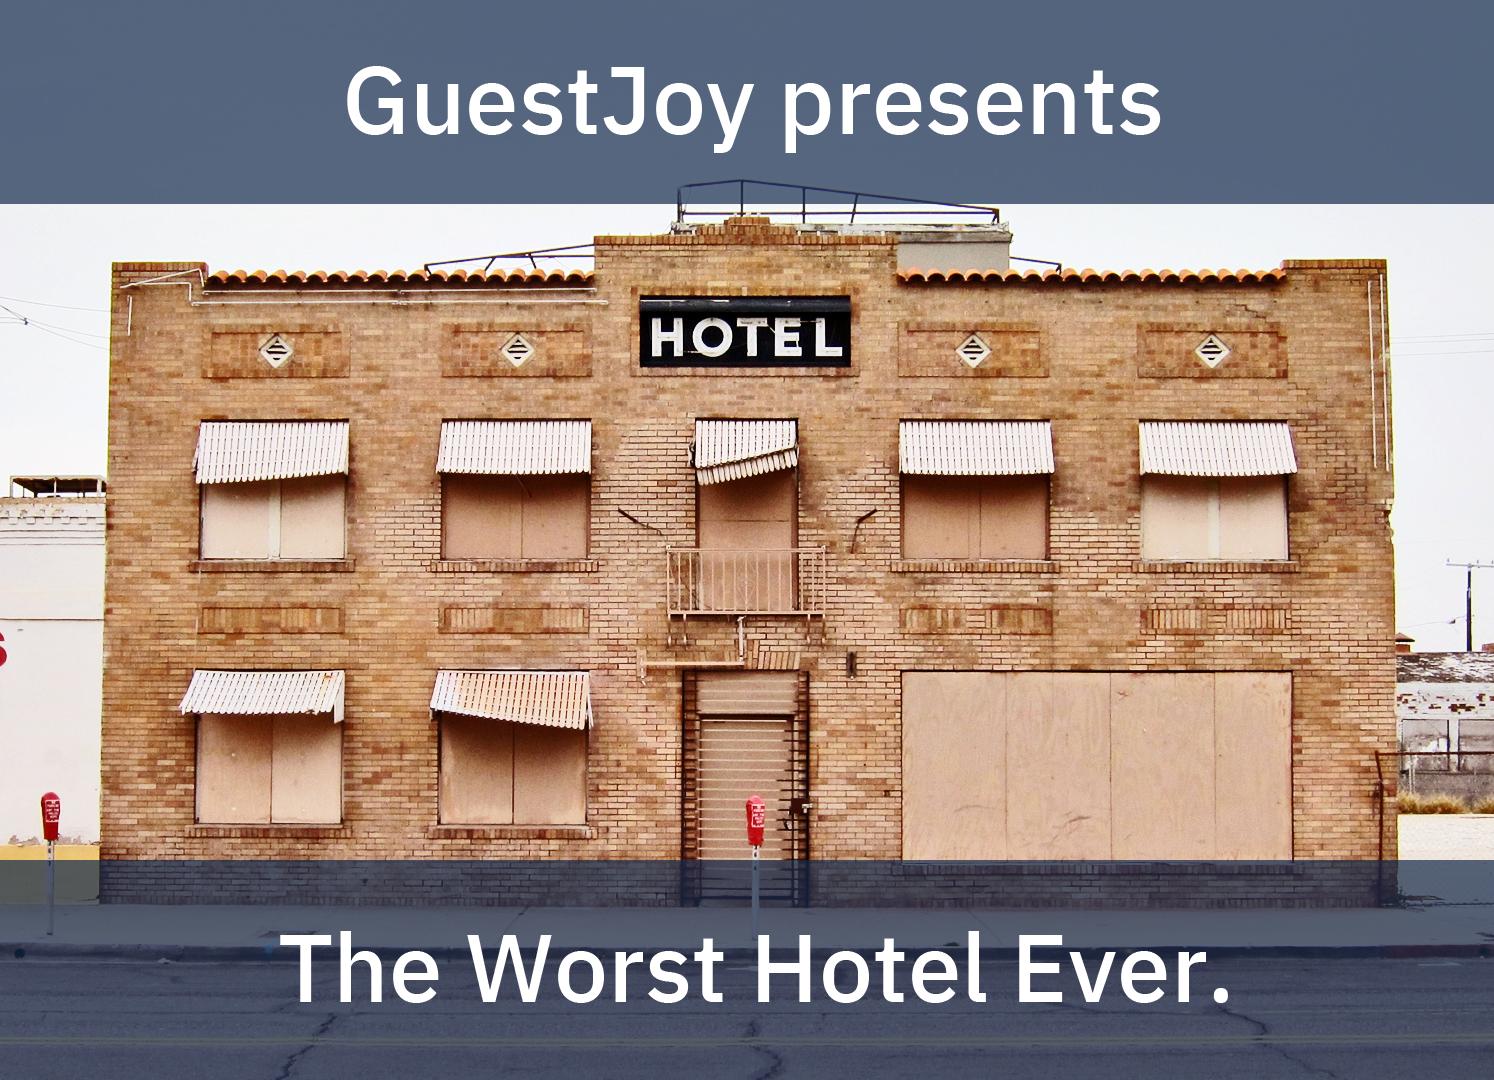 The Worst Hotel